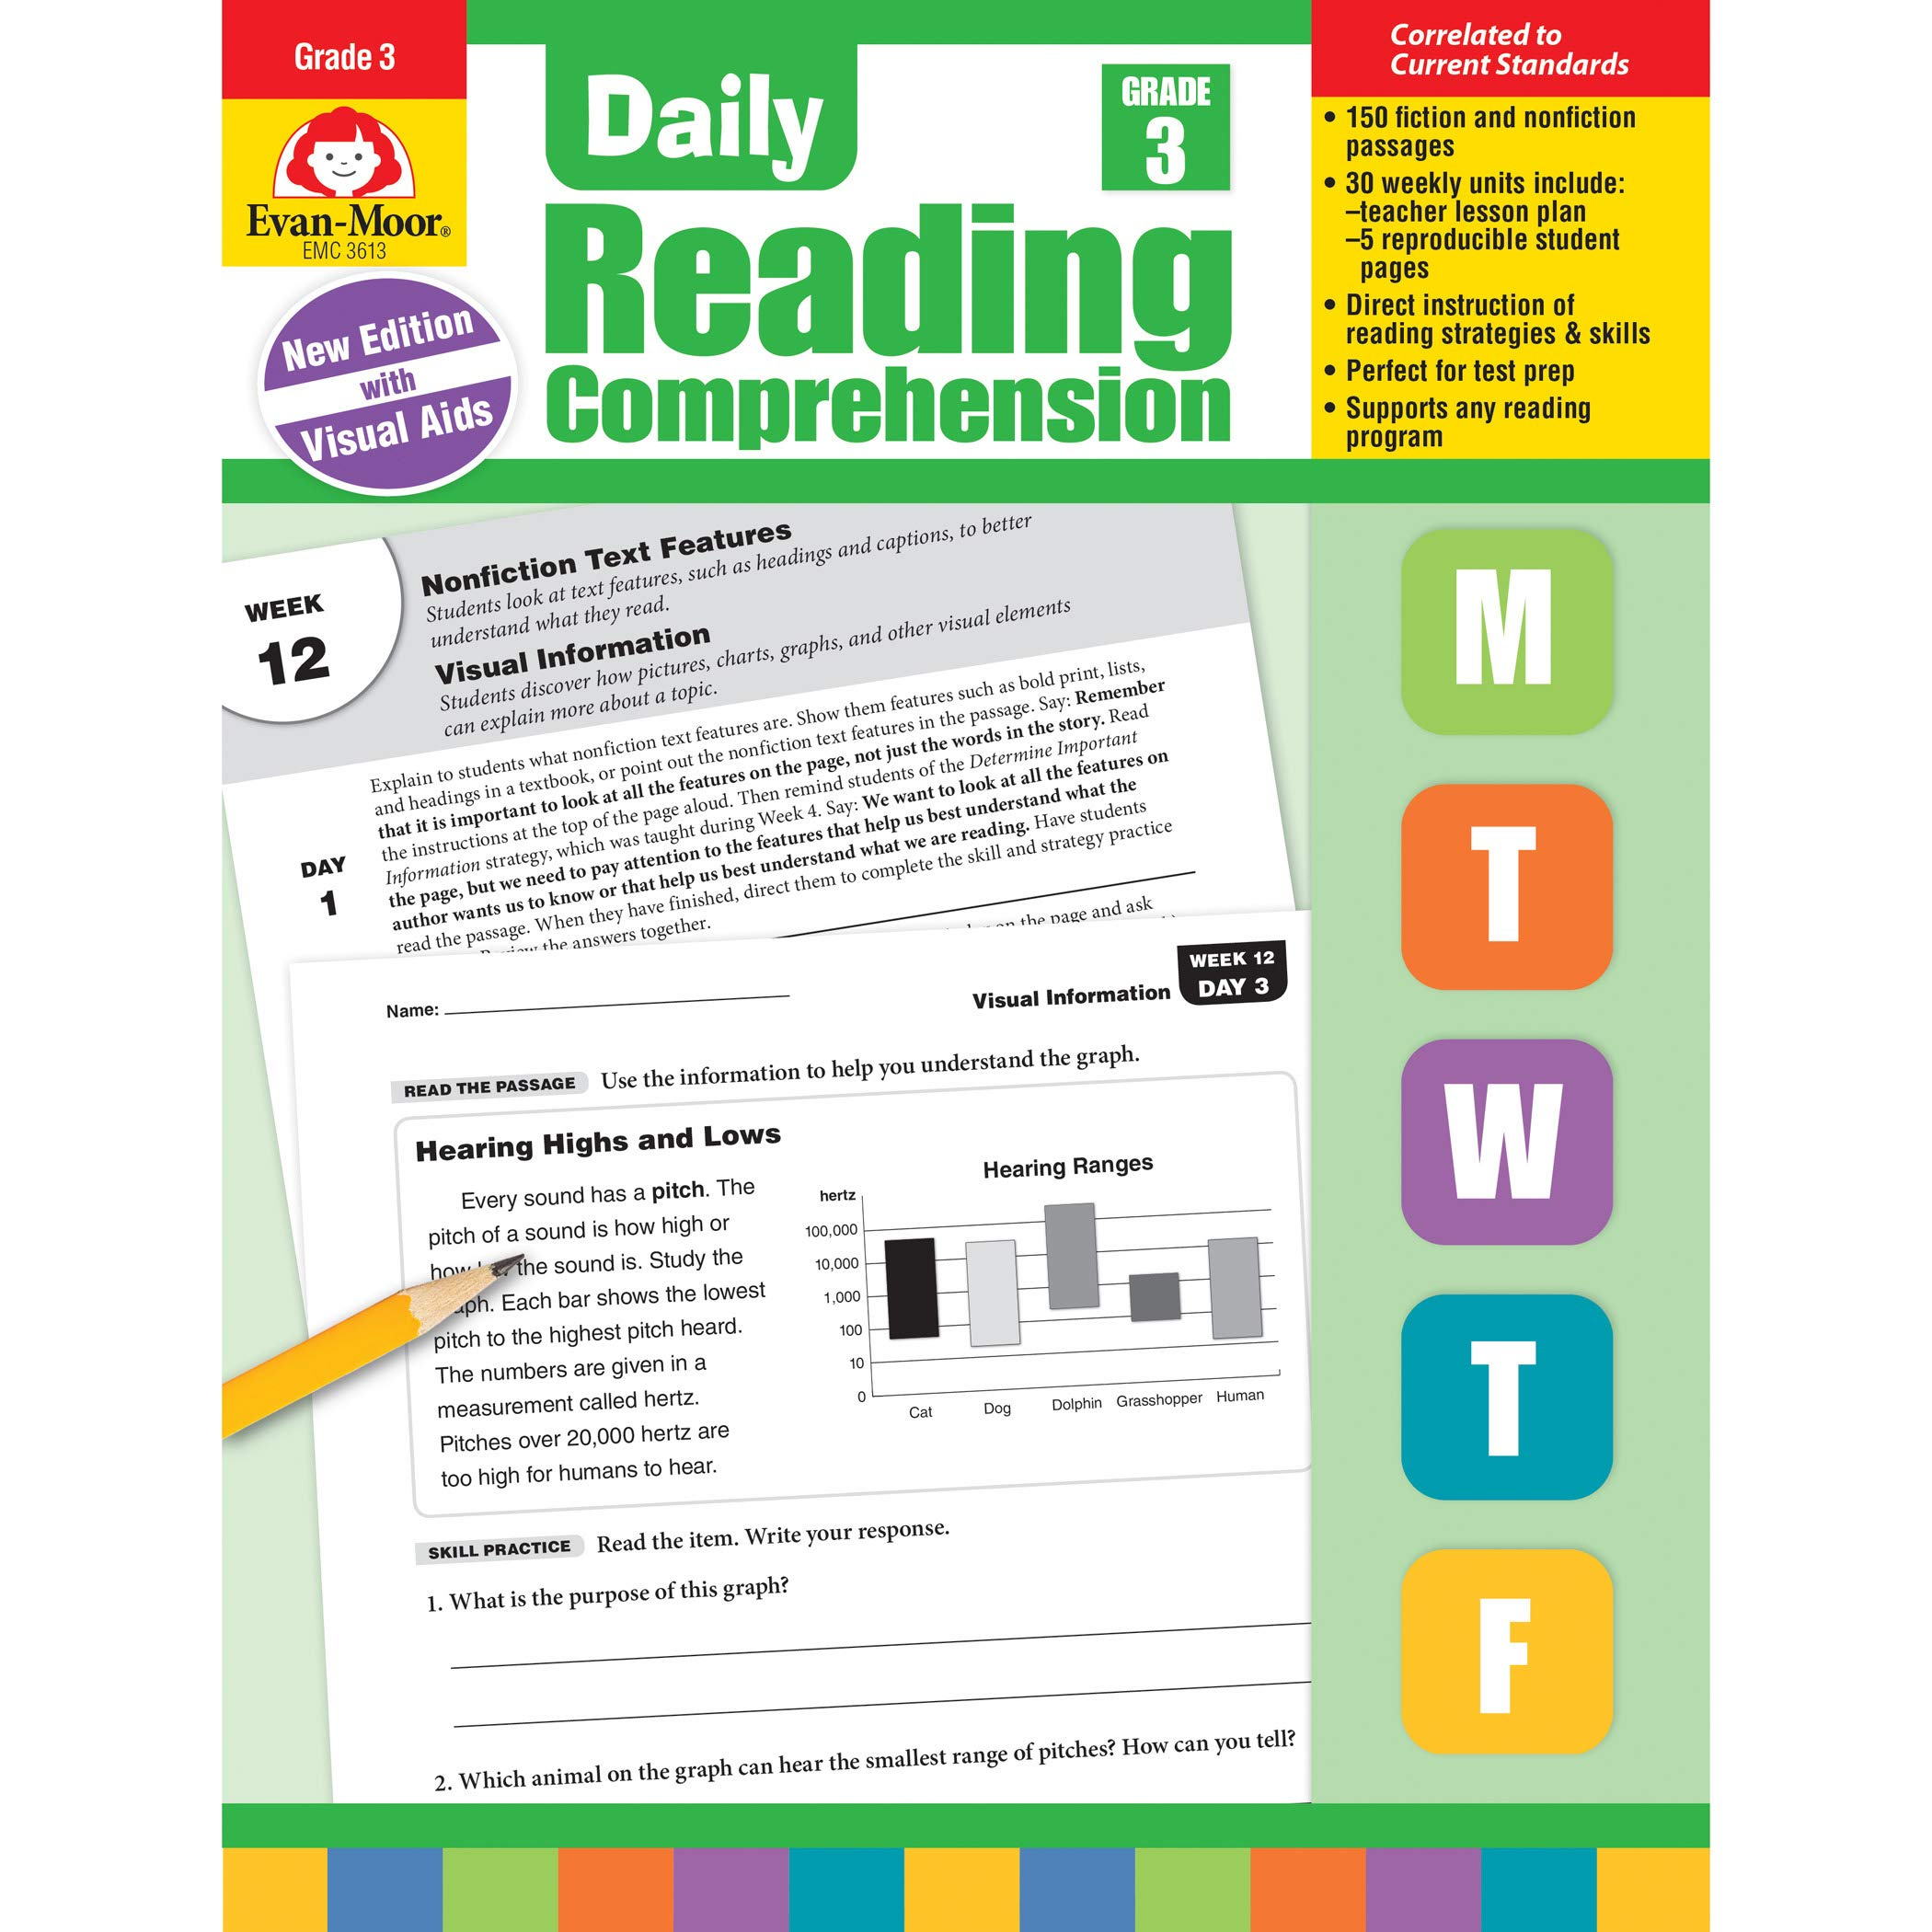 Daily Reading Comprehension Grade 3 Pdf